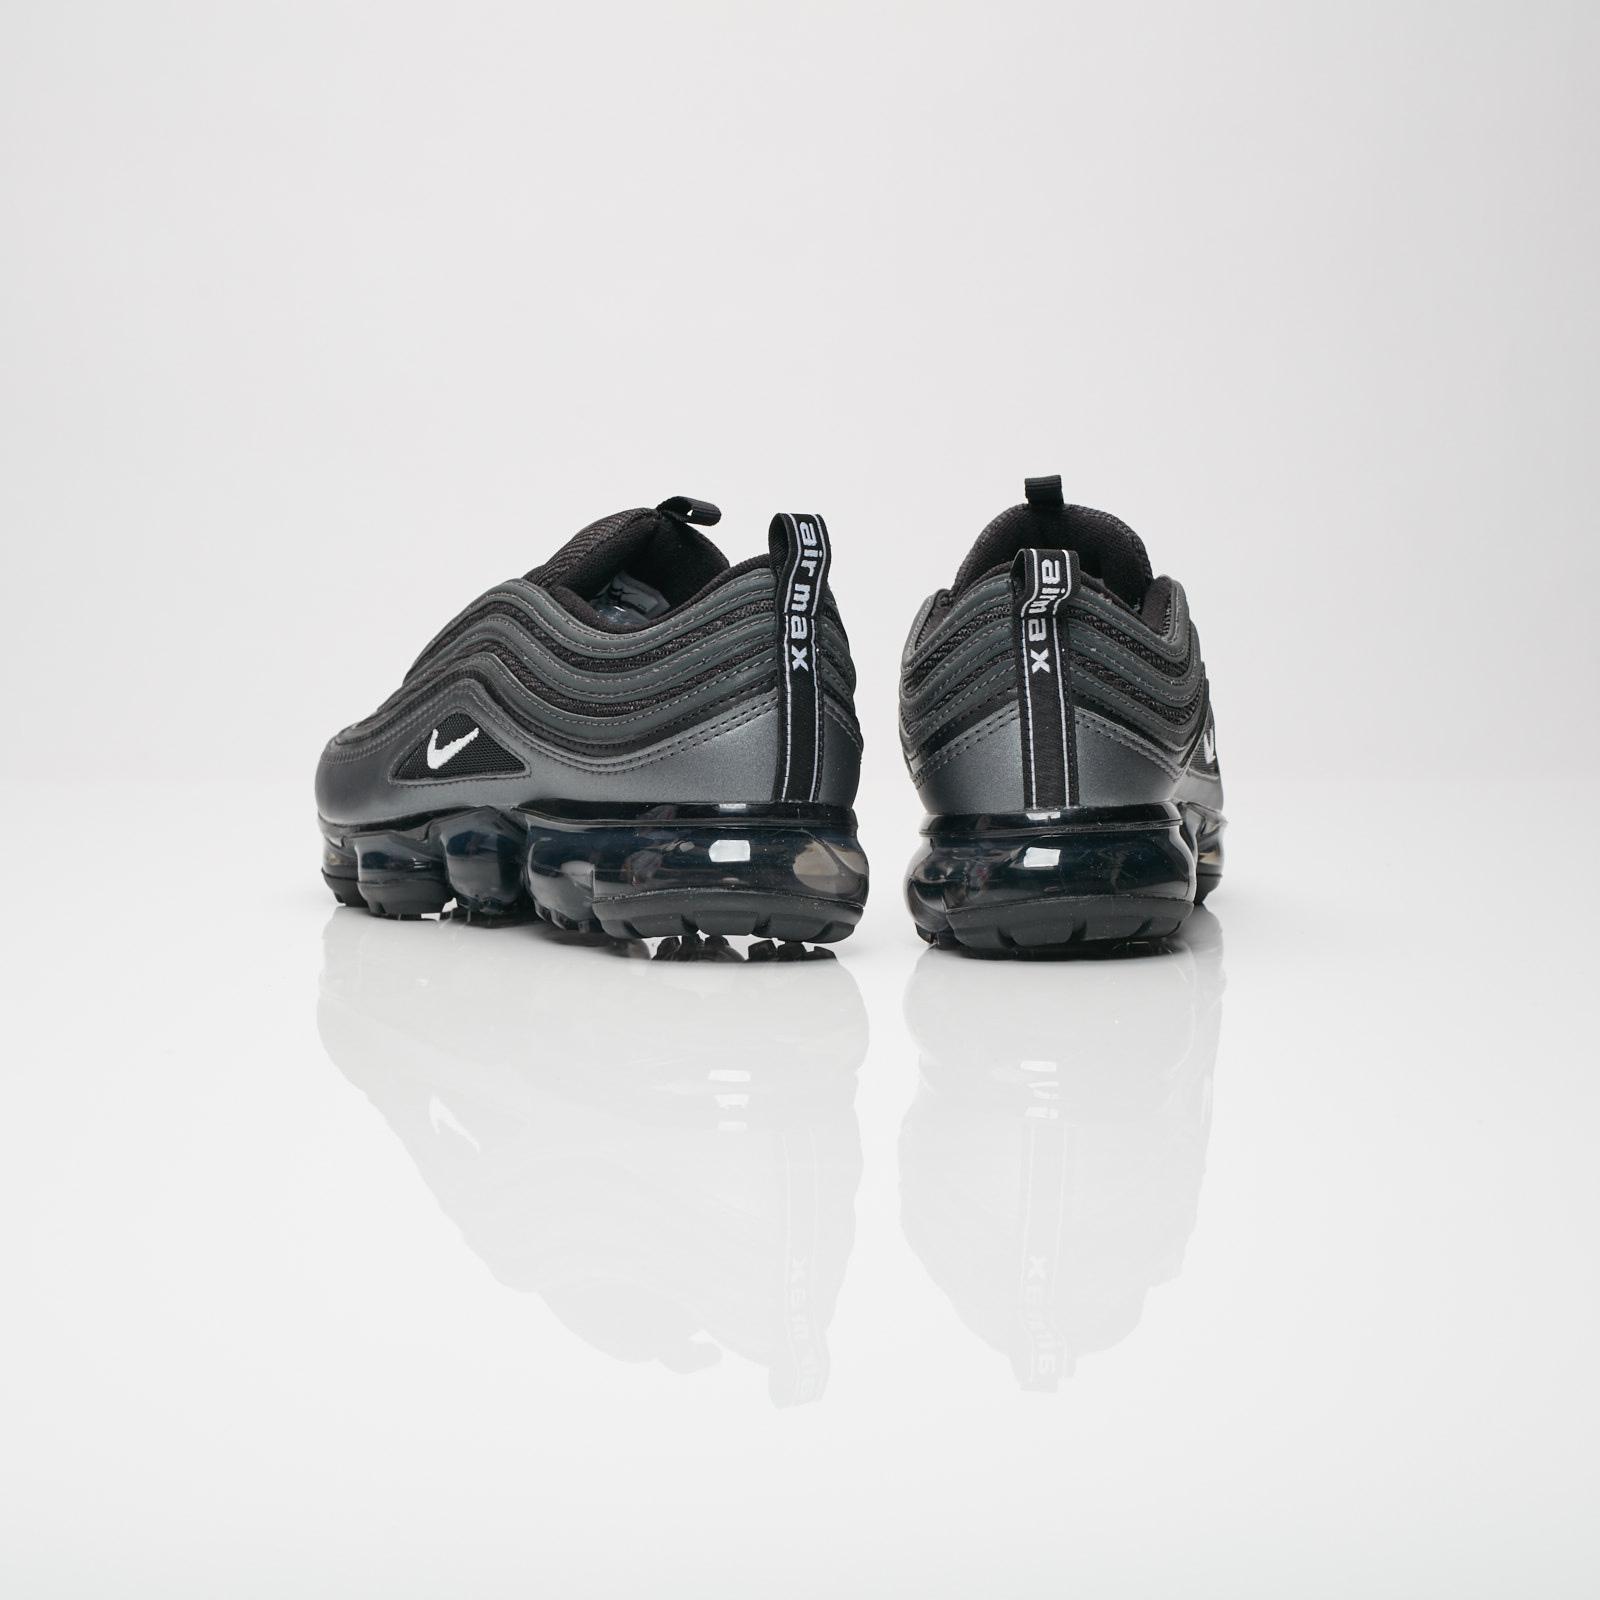 25c19e0573c293 Nike W Air Vapormax 97 - Ao4542-001 - Sneakersnstuff